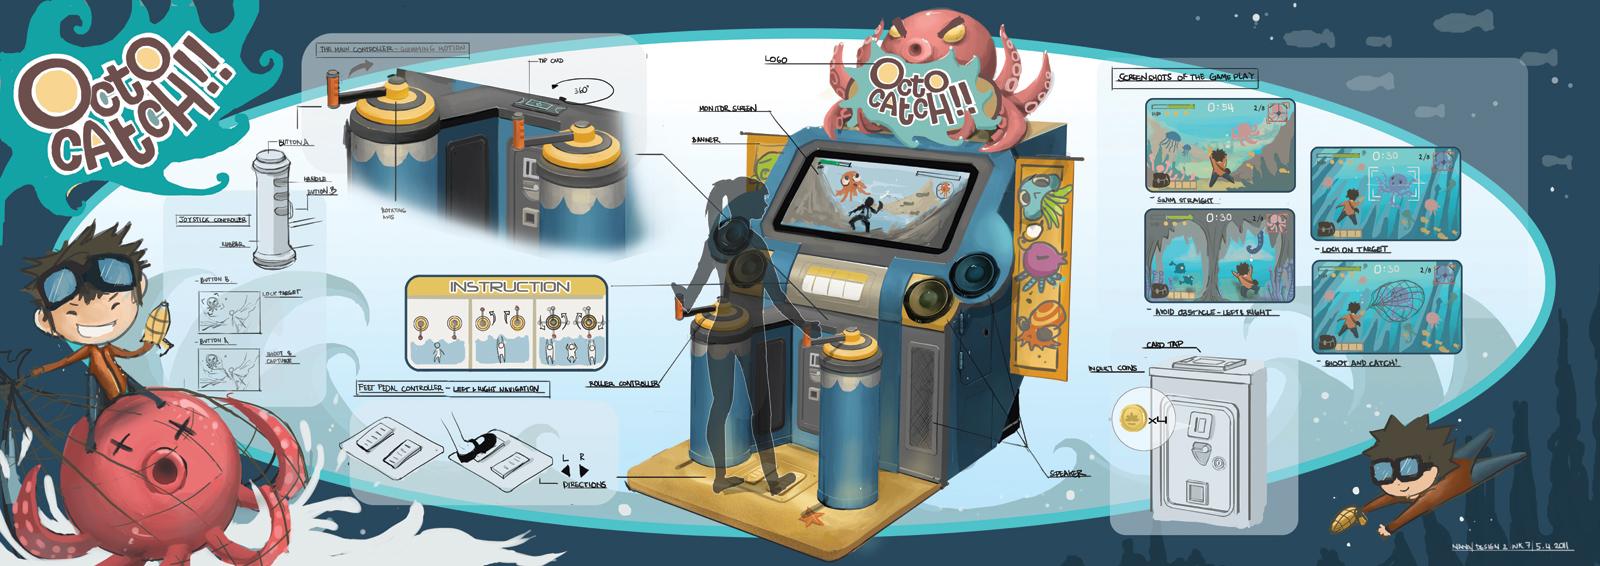 arcade machine design